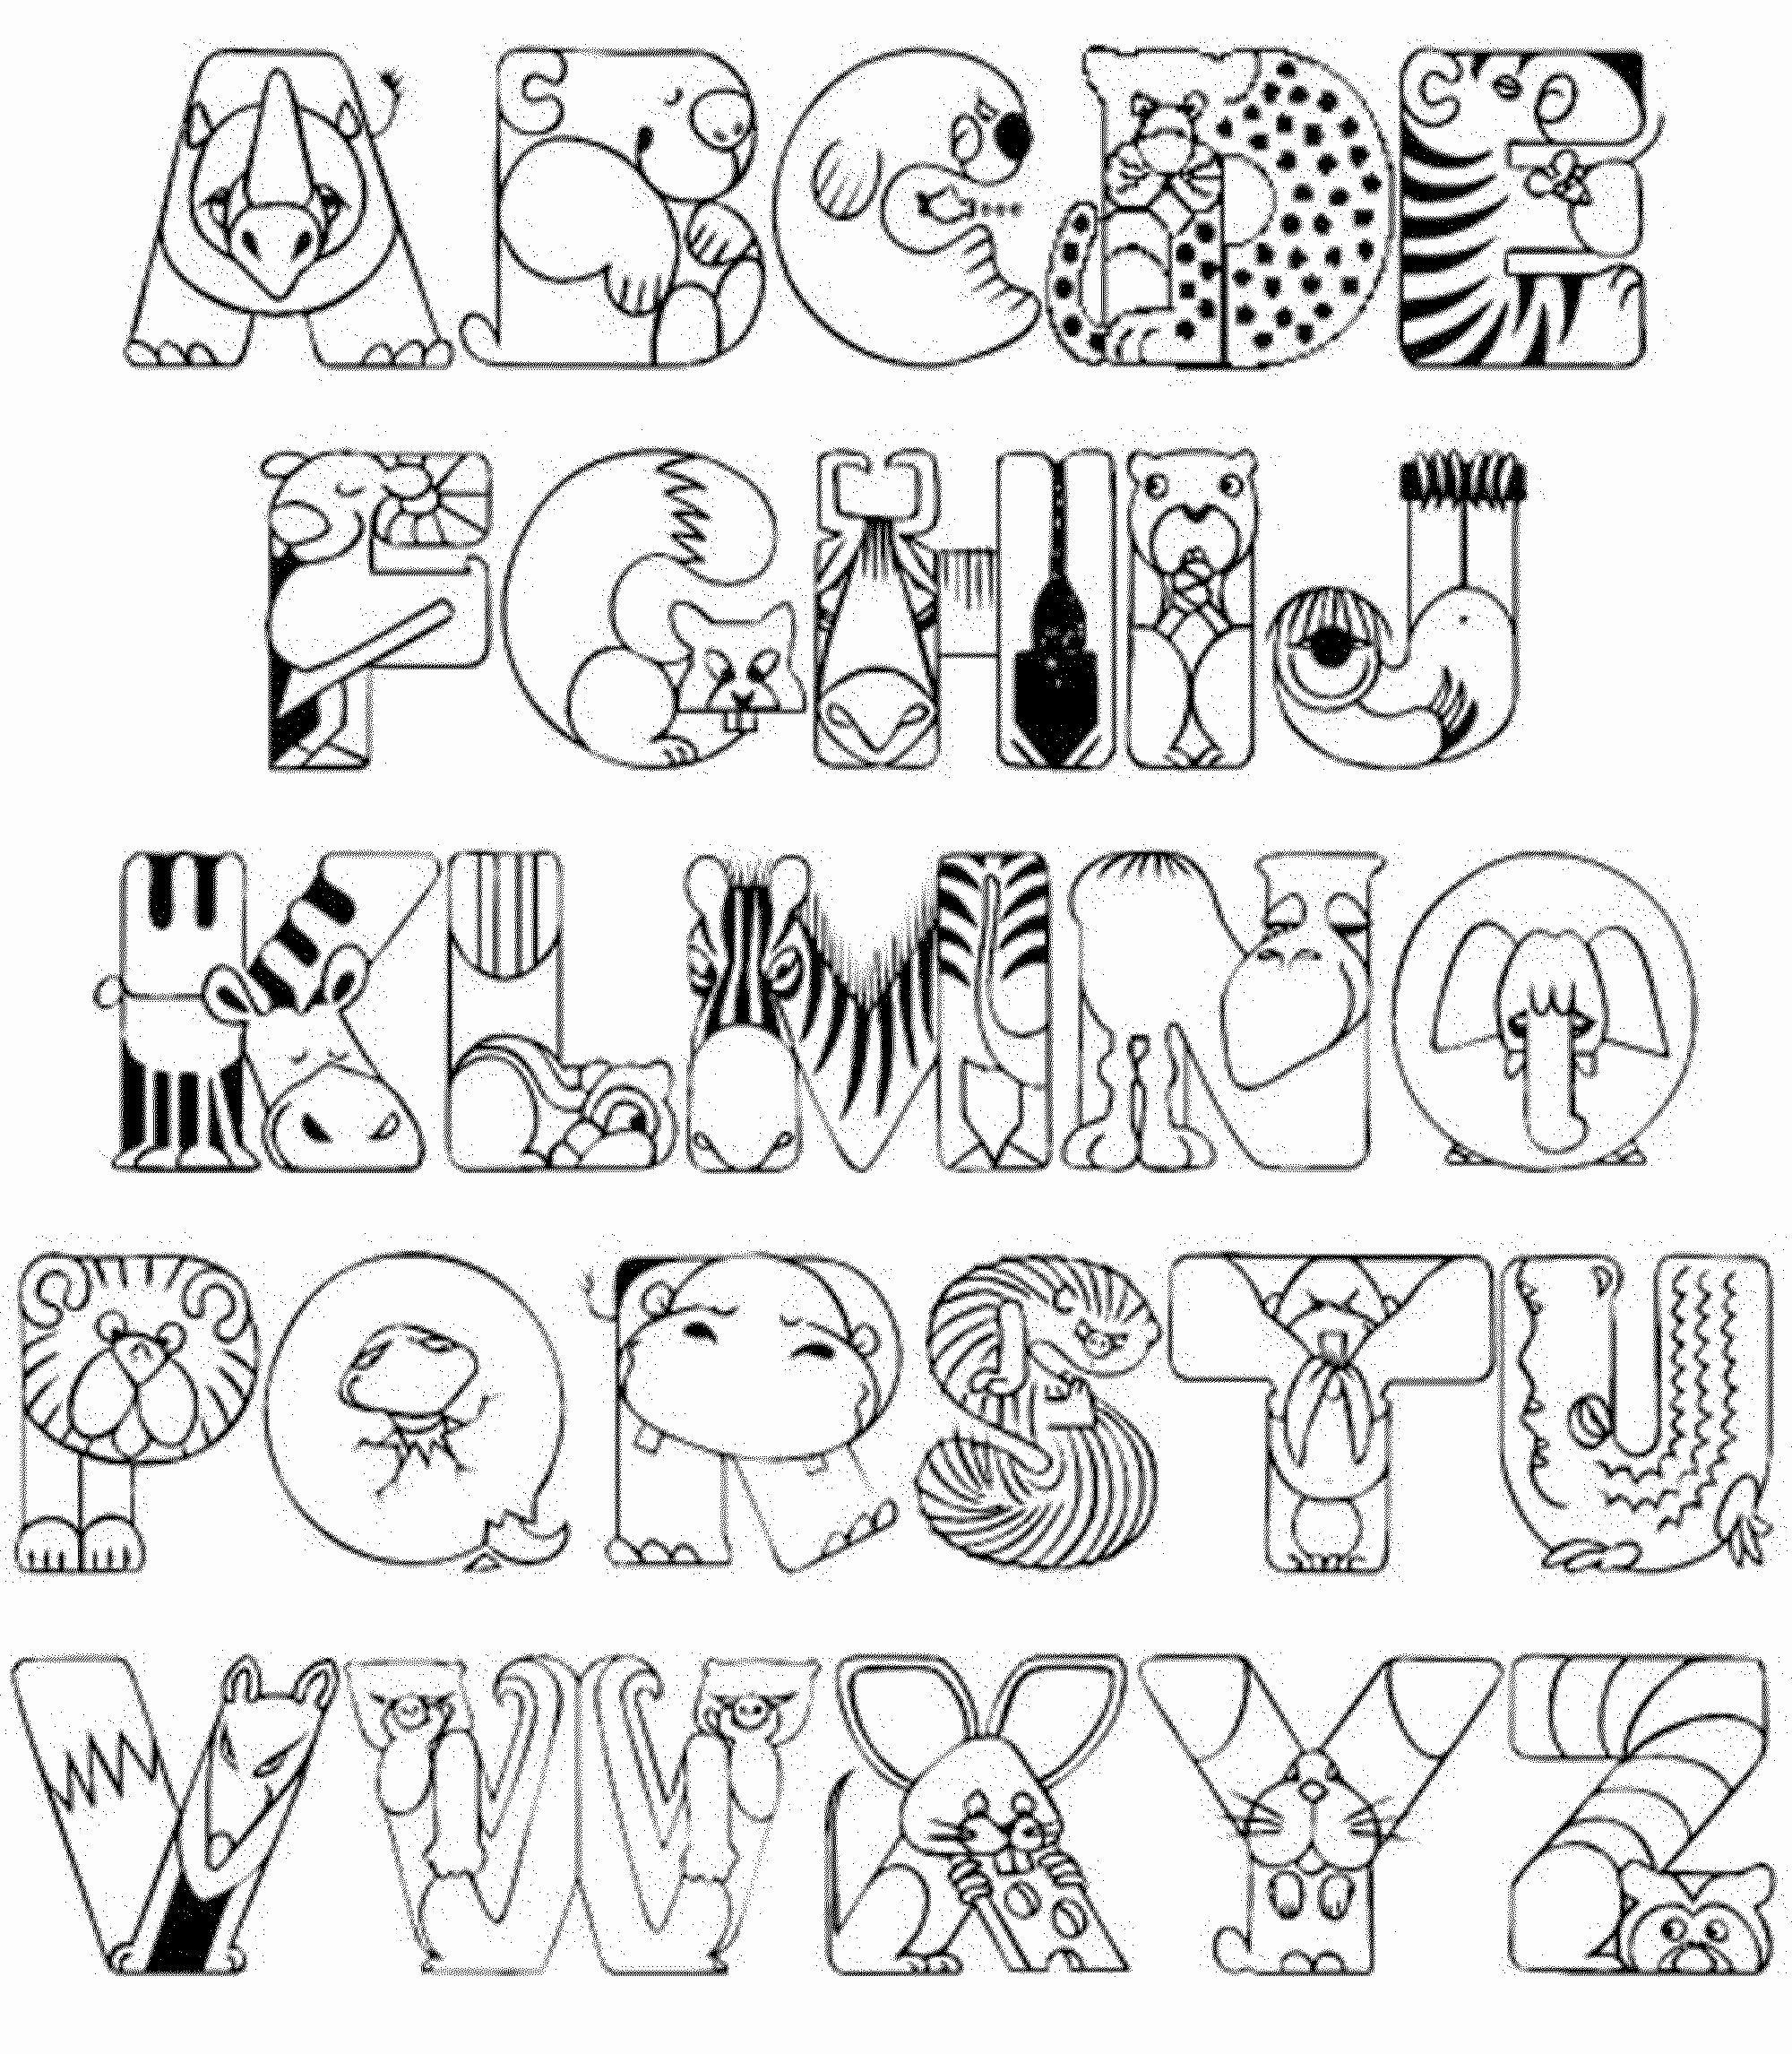 Alphabet Coloring Pages Preschool Pdf intended for Alphabet Coloring Worksheets For Kindergarten